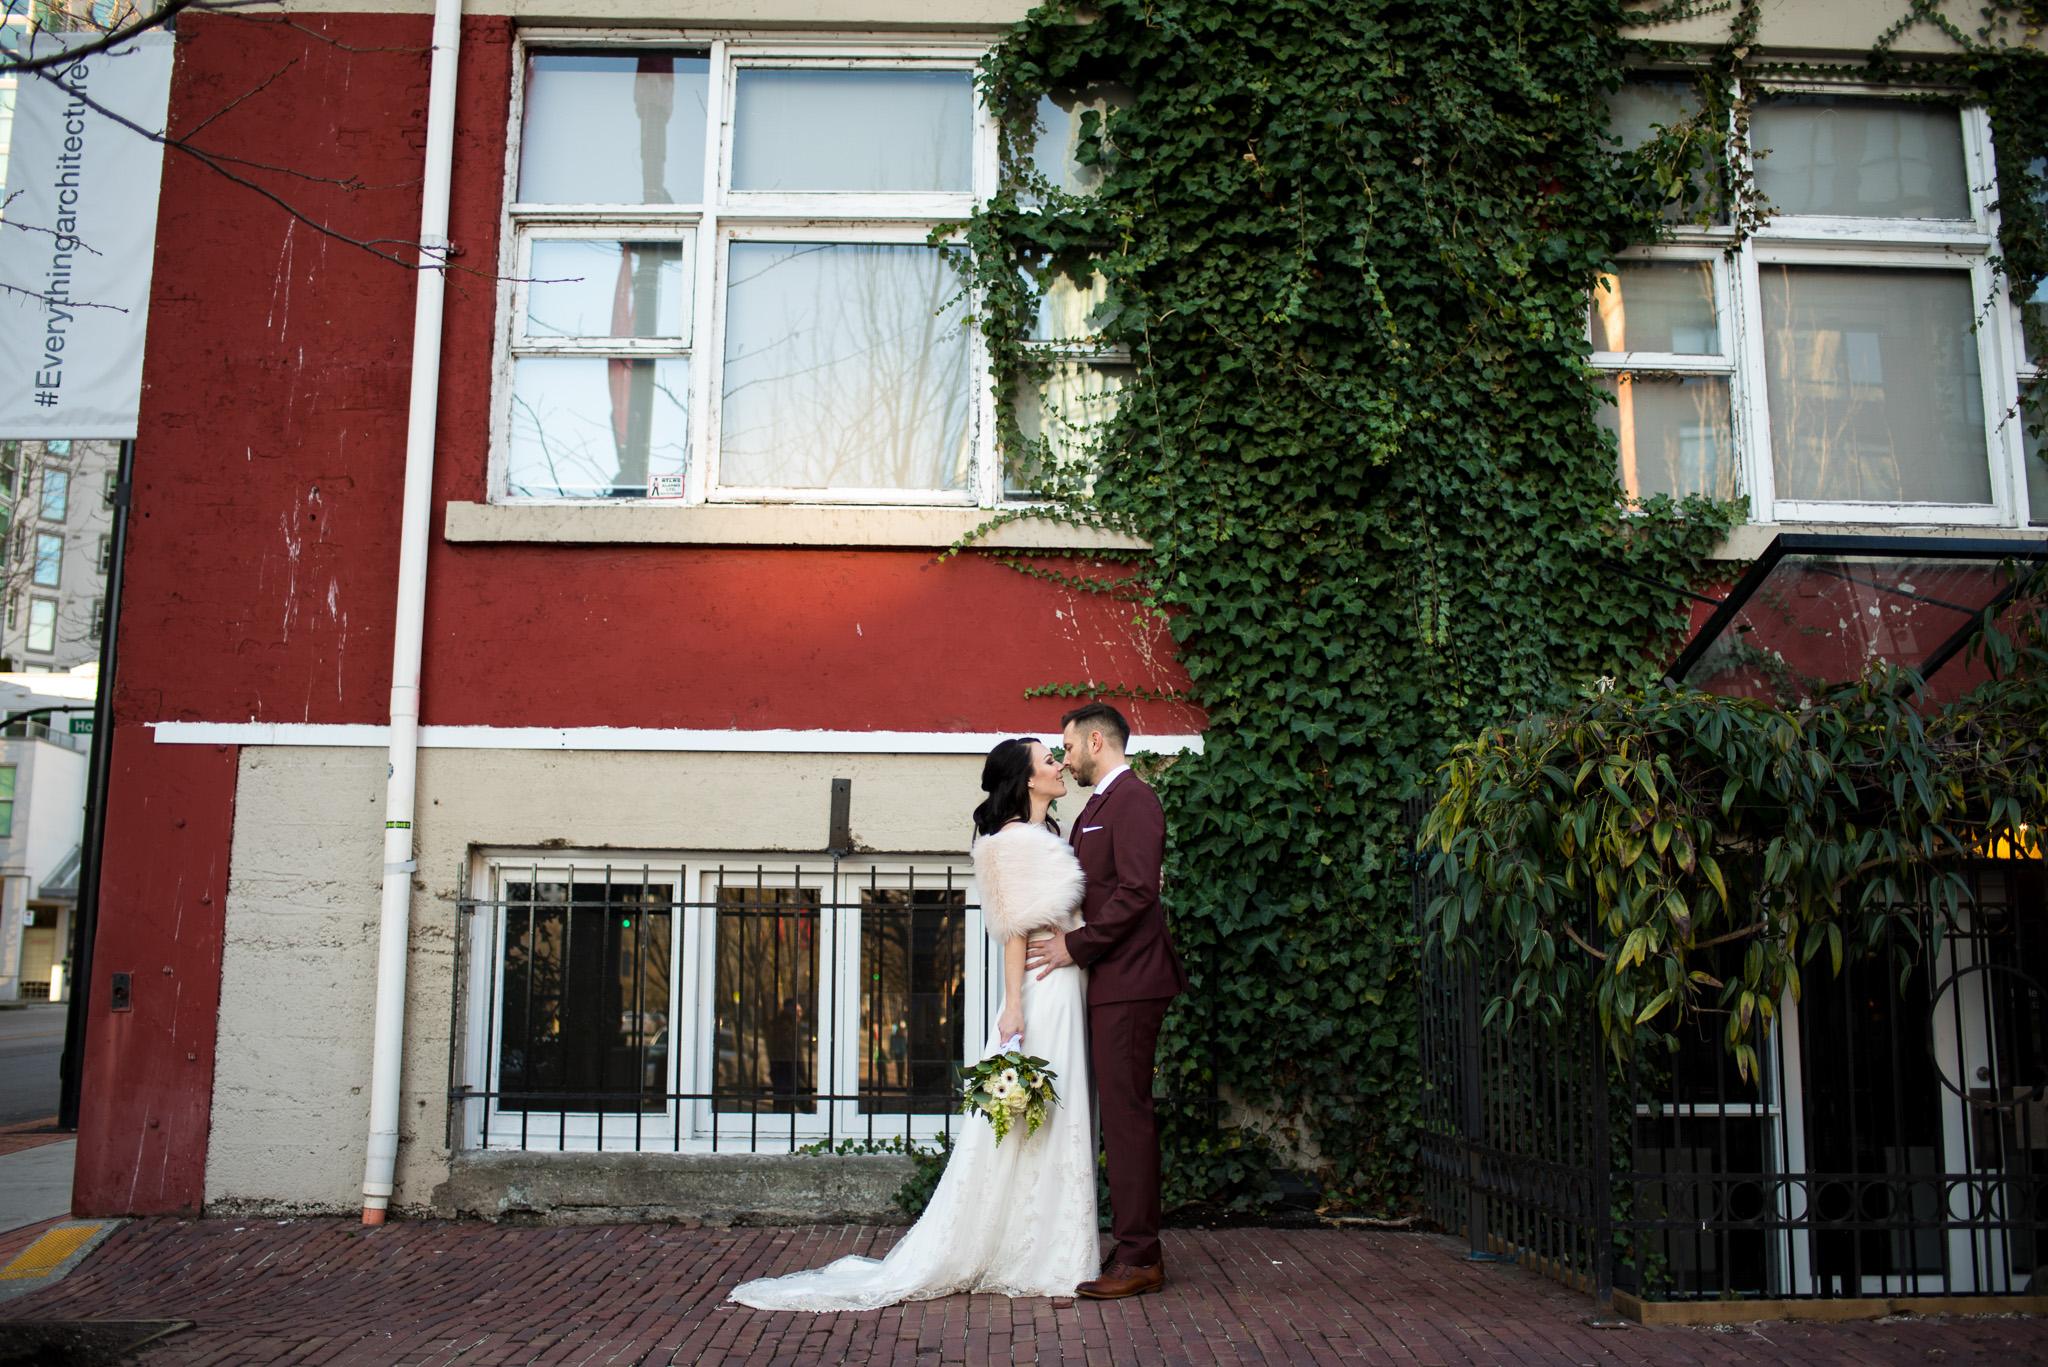 Brix and Mortar Wedding Photos-45.jpg